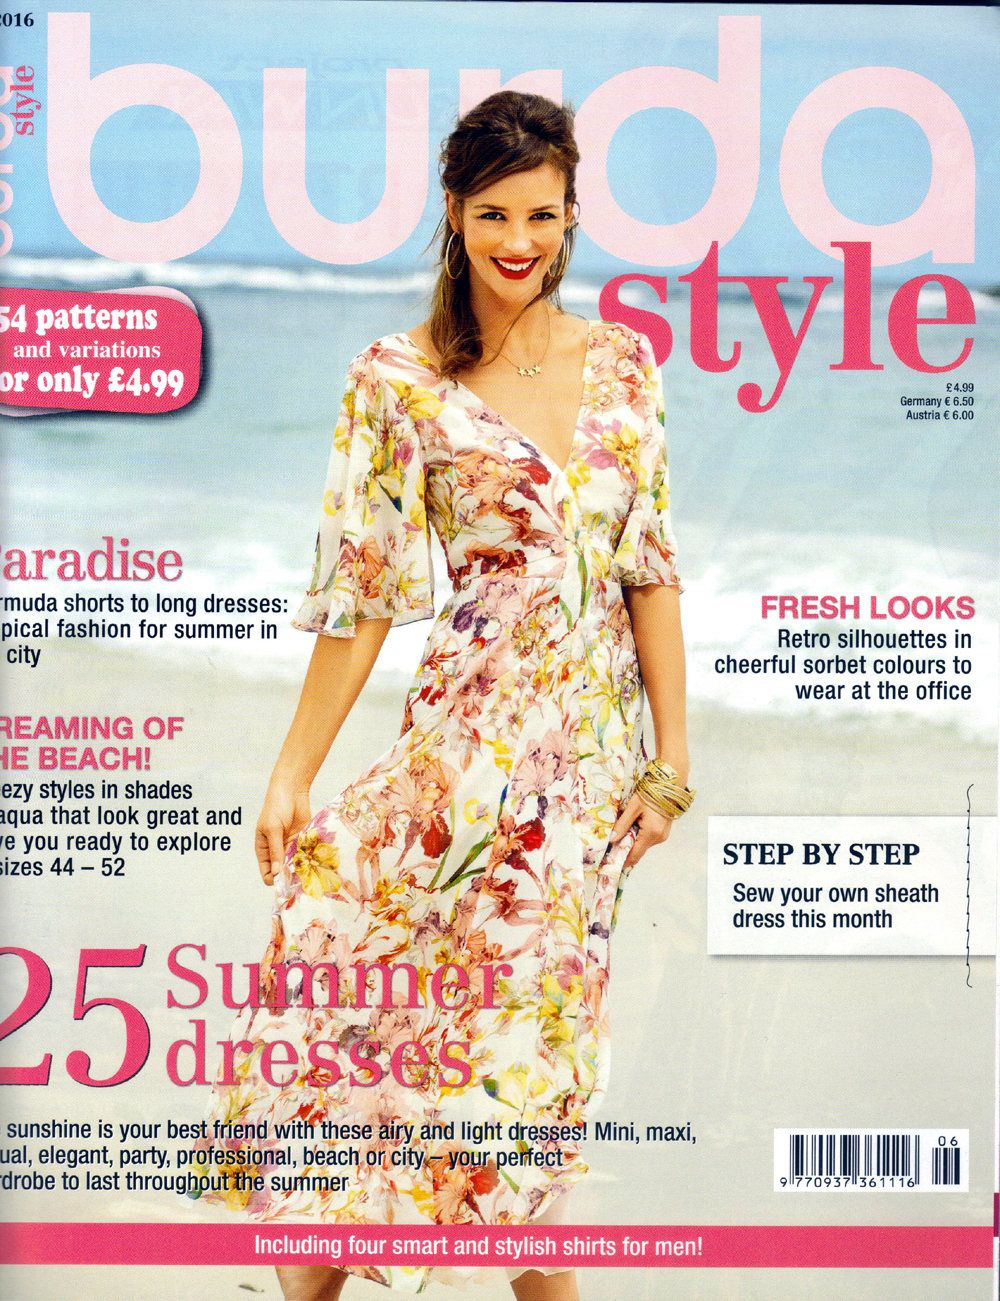 Burda style magazine 62016 english sewing patterns by burda style magazine 62016 english sewing patterns by honeyjamsuniques on etsy jeuxipadfo Image collections